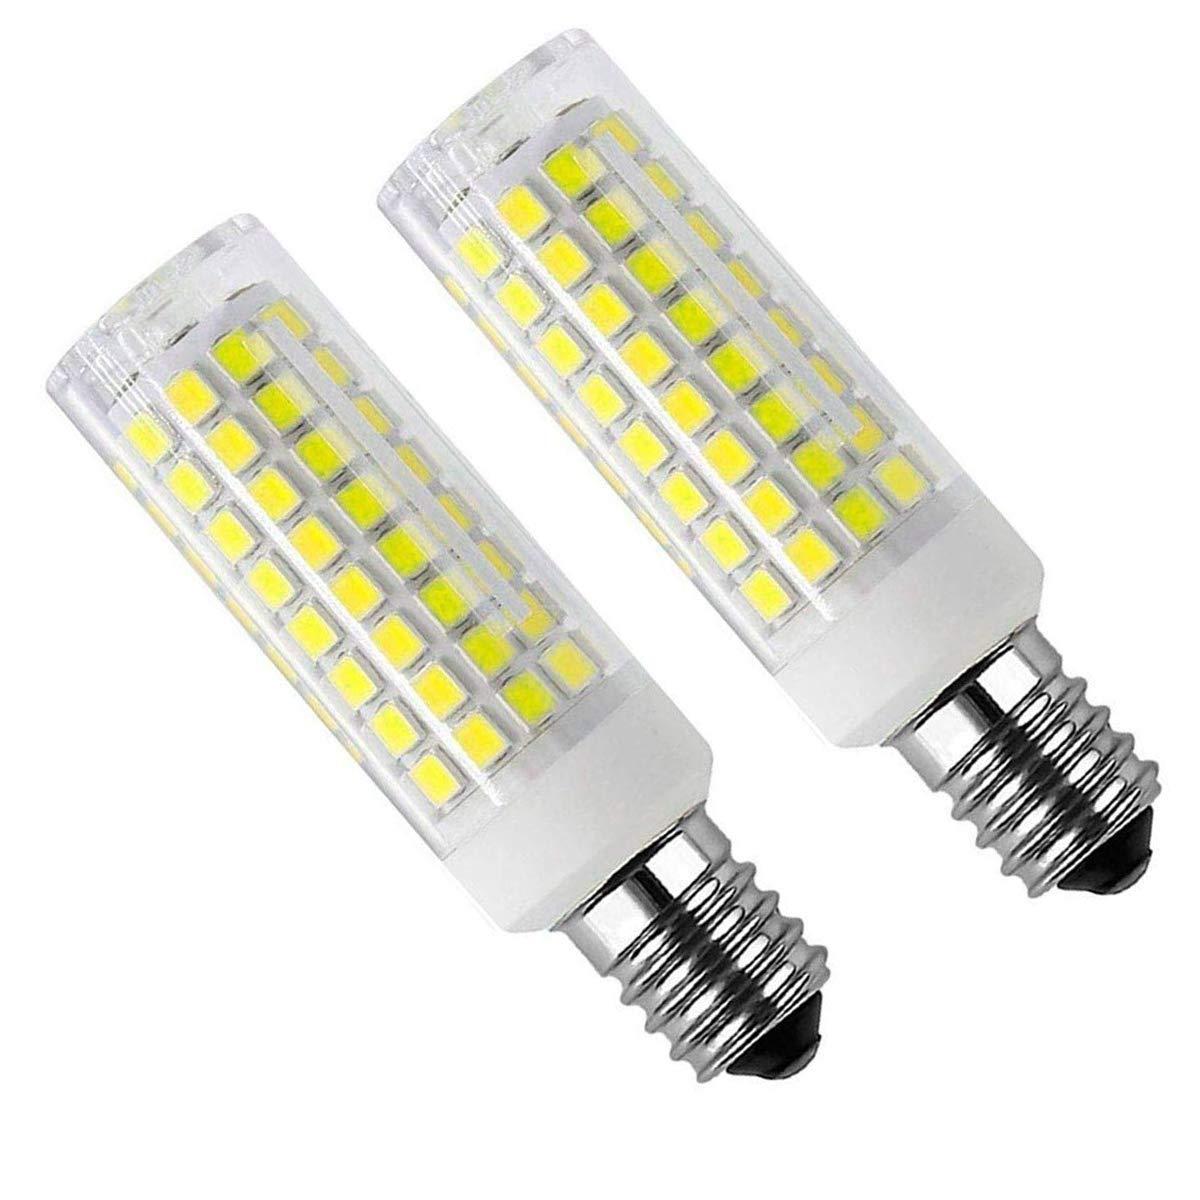 E14 Light Bulb E14 European Base Bulb,E14 LED Refrigerator Light Bulb,E14 Base LED Light Bulbs 8W LED Light (Equivalent to75W Incandescent Bulb) 90-2835-SMD LED Chipsets (E14-Daylight White -Dimmable)